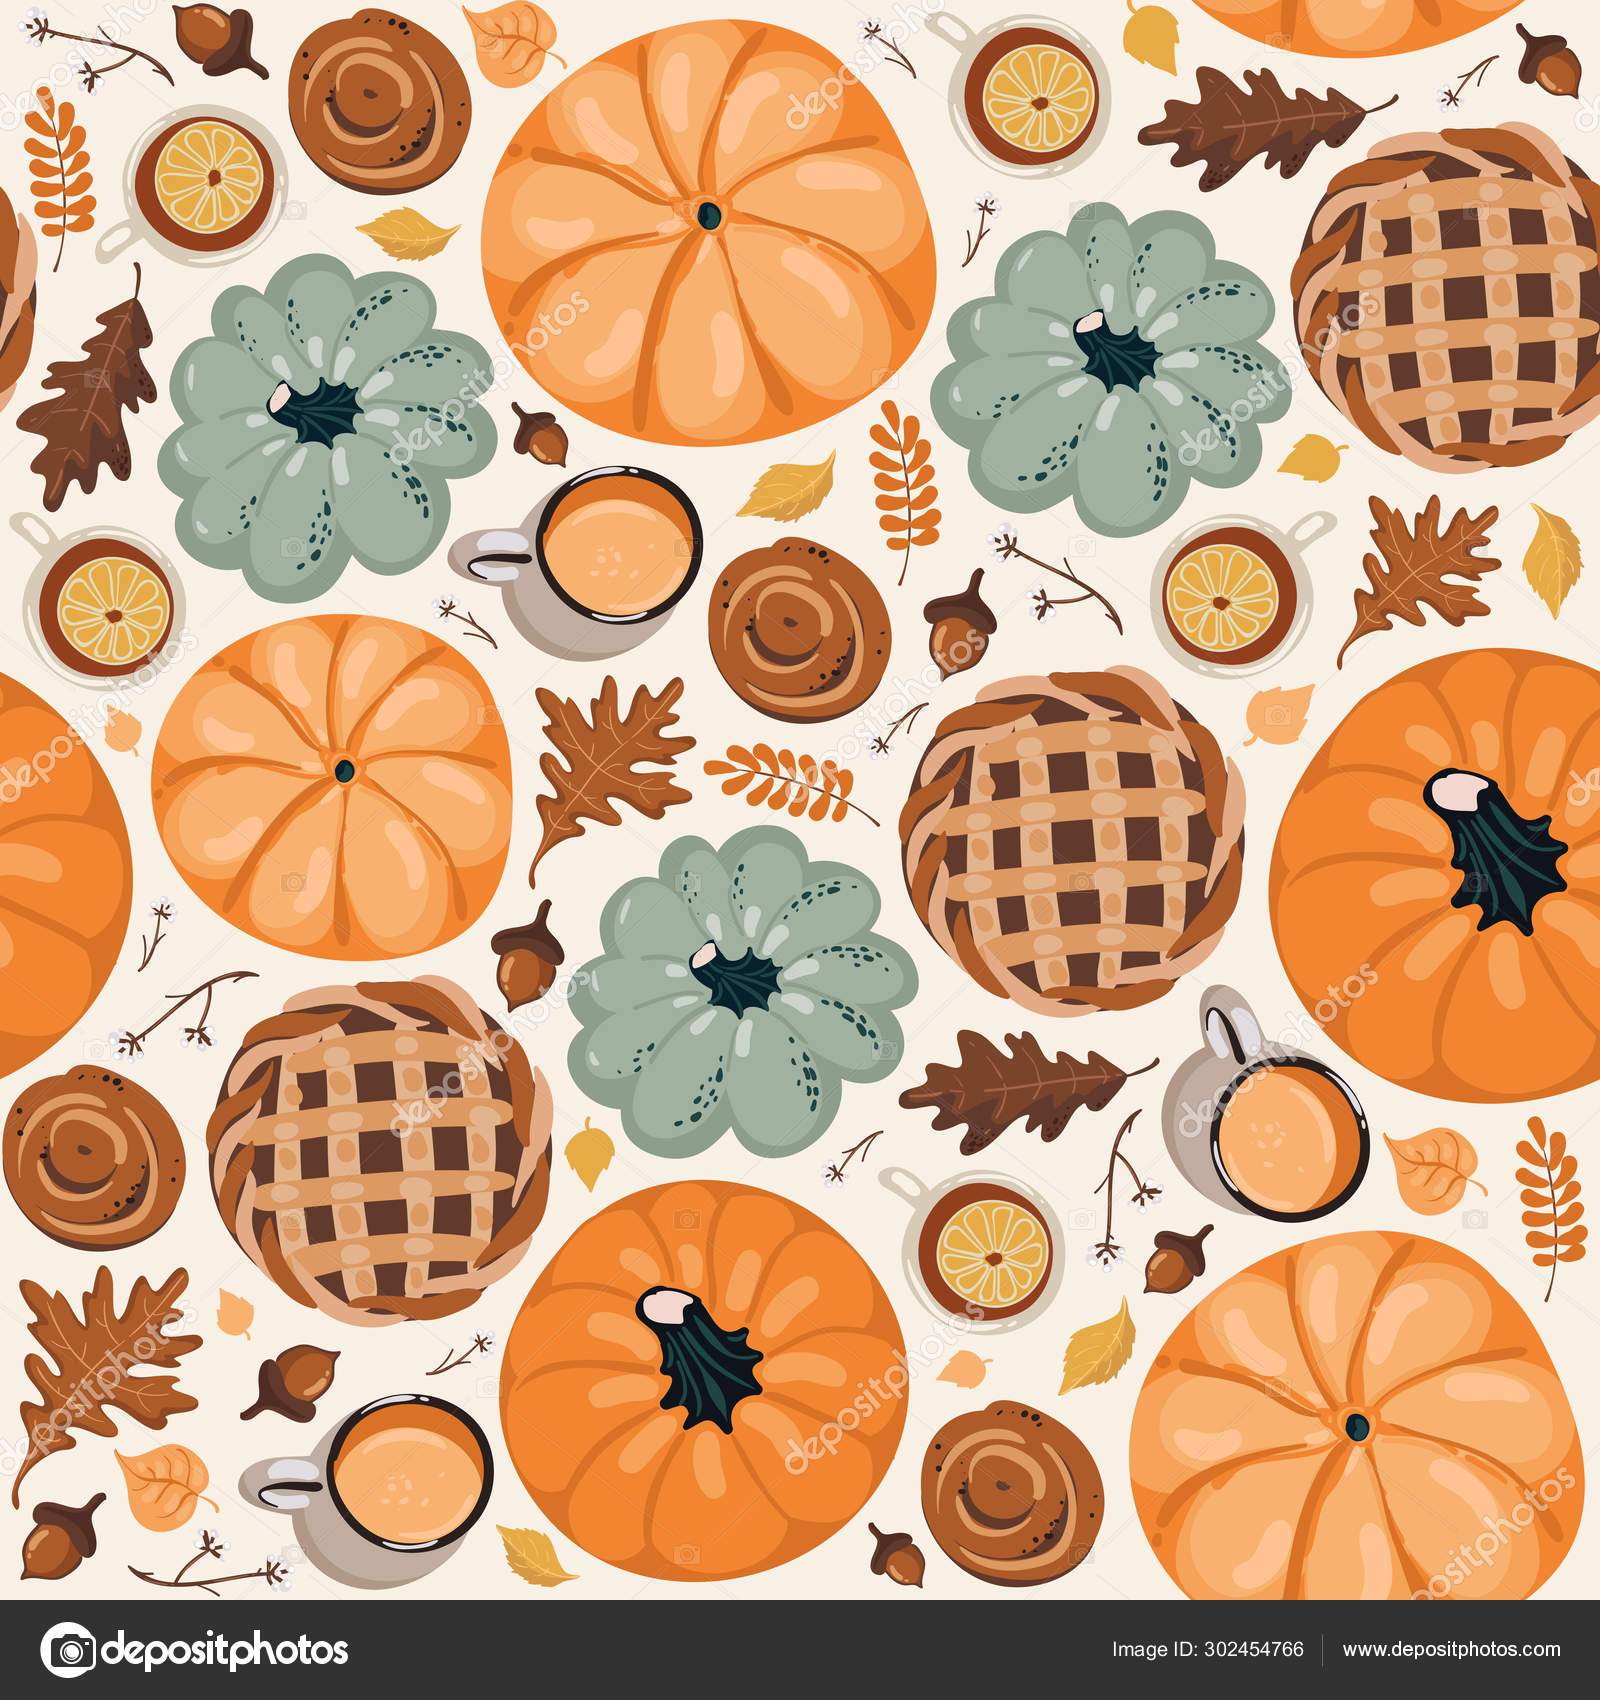 Cute seamless autumn pattern background